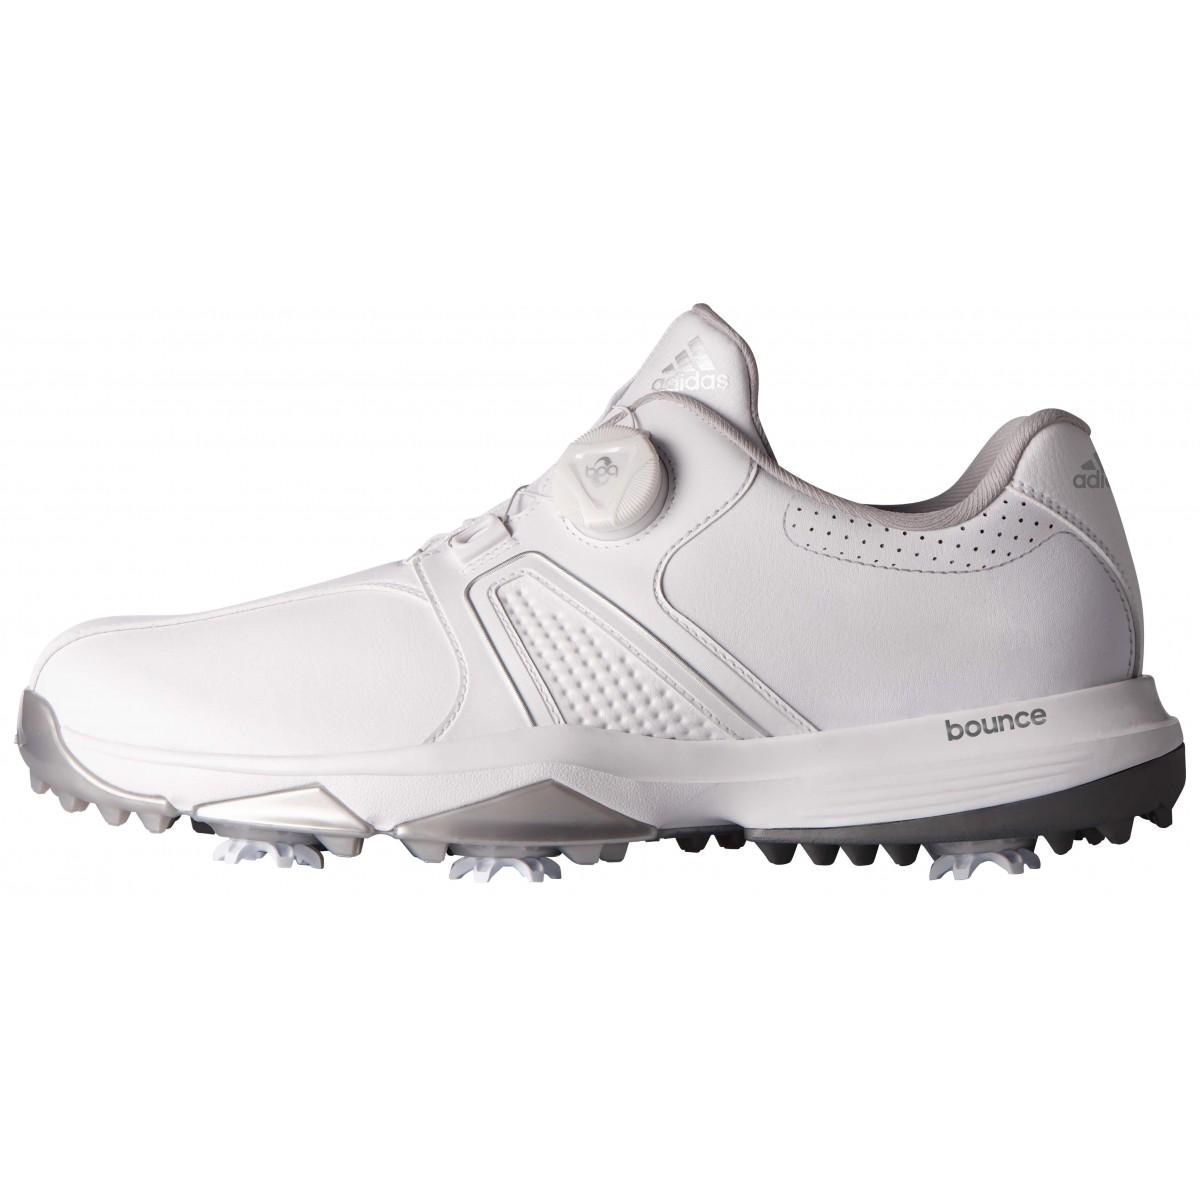 Adidas 360 Traxion BOA White